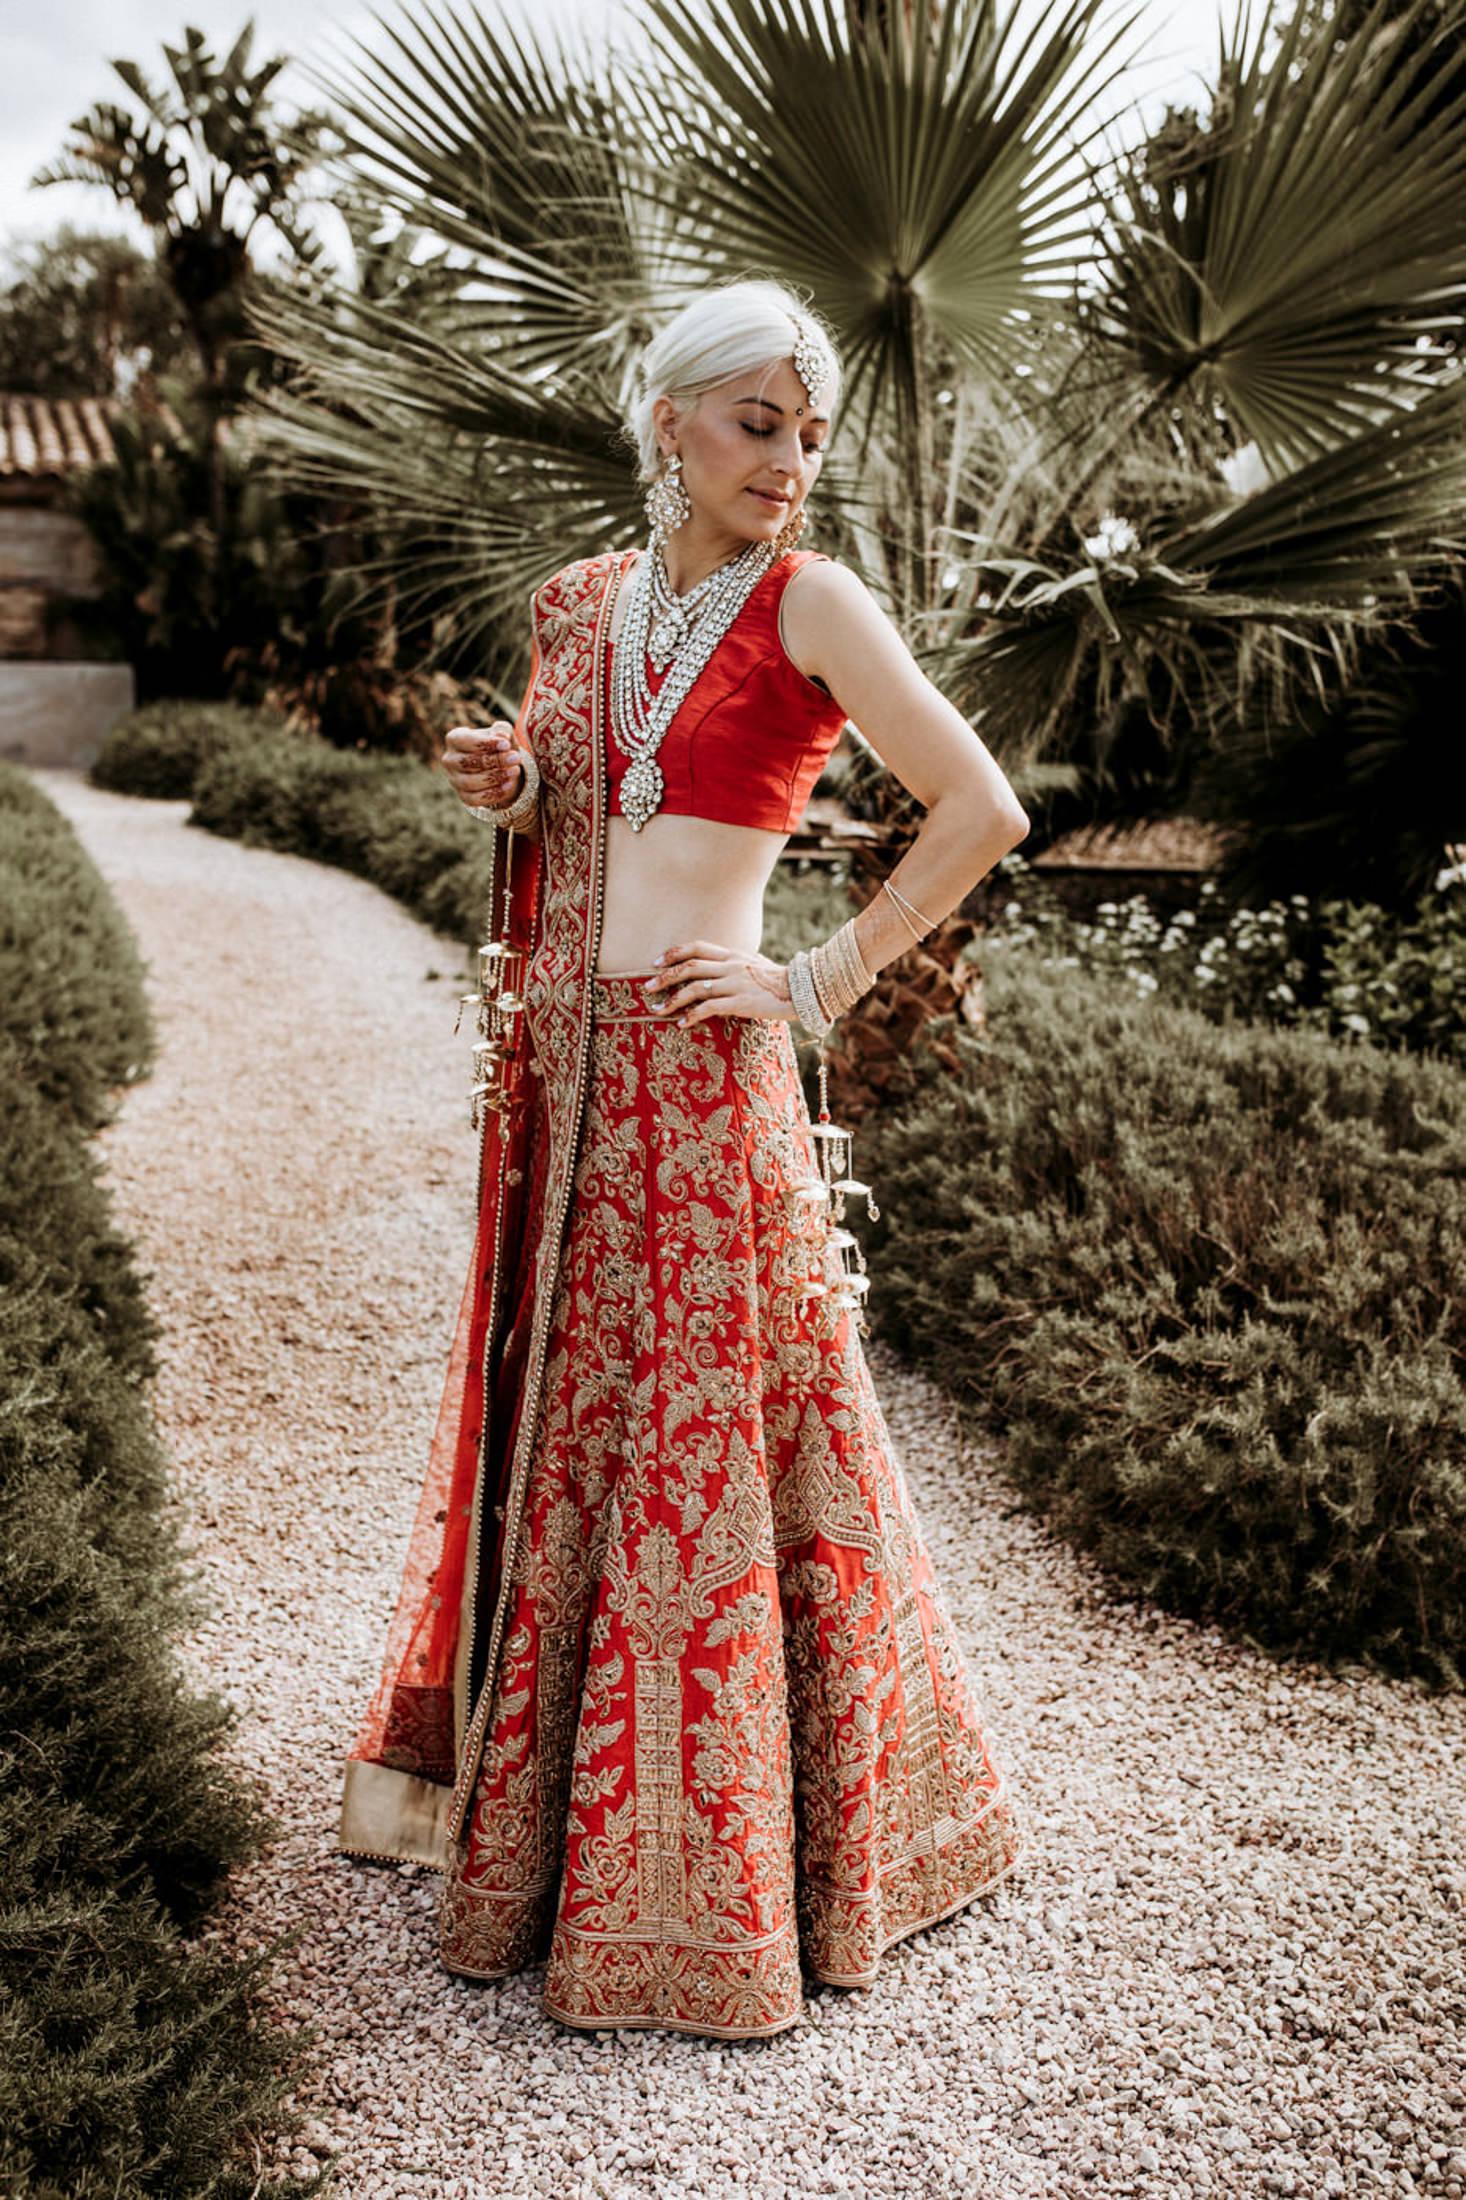 Wedding_Photographer_Mallorca_Daniela-Marquardt_Photography_New_York_Iceland_Tuscany_Santorini_Portugal_Austria_Bavaria_Elopement_Hochzeitsfotograf_AntjeRajat2_64